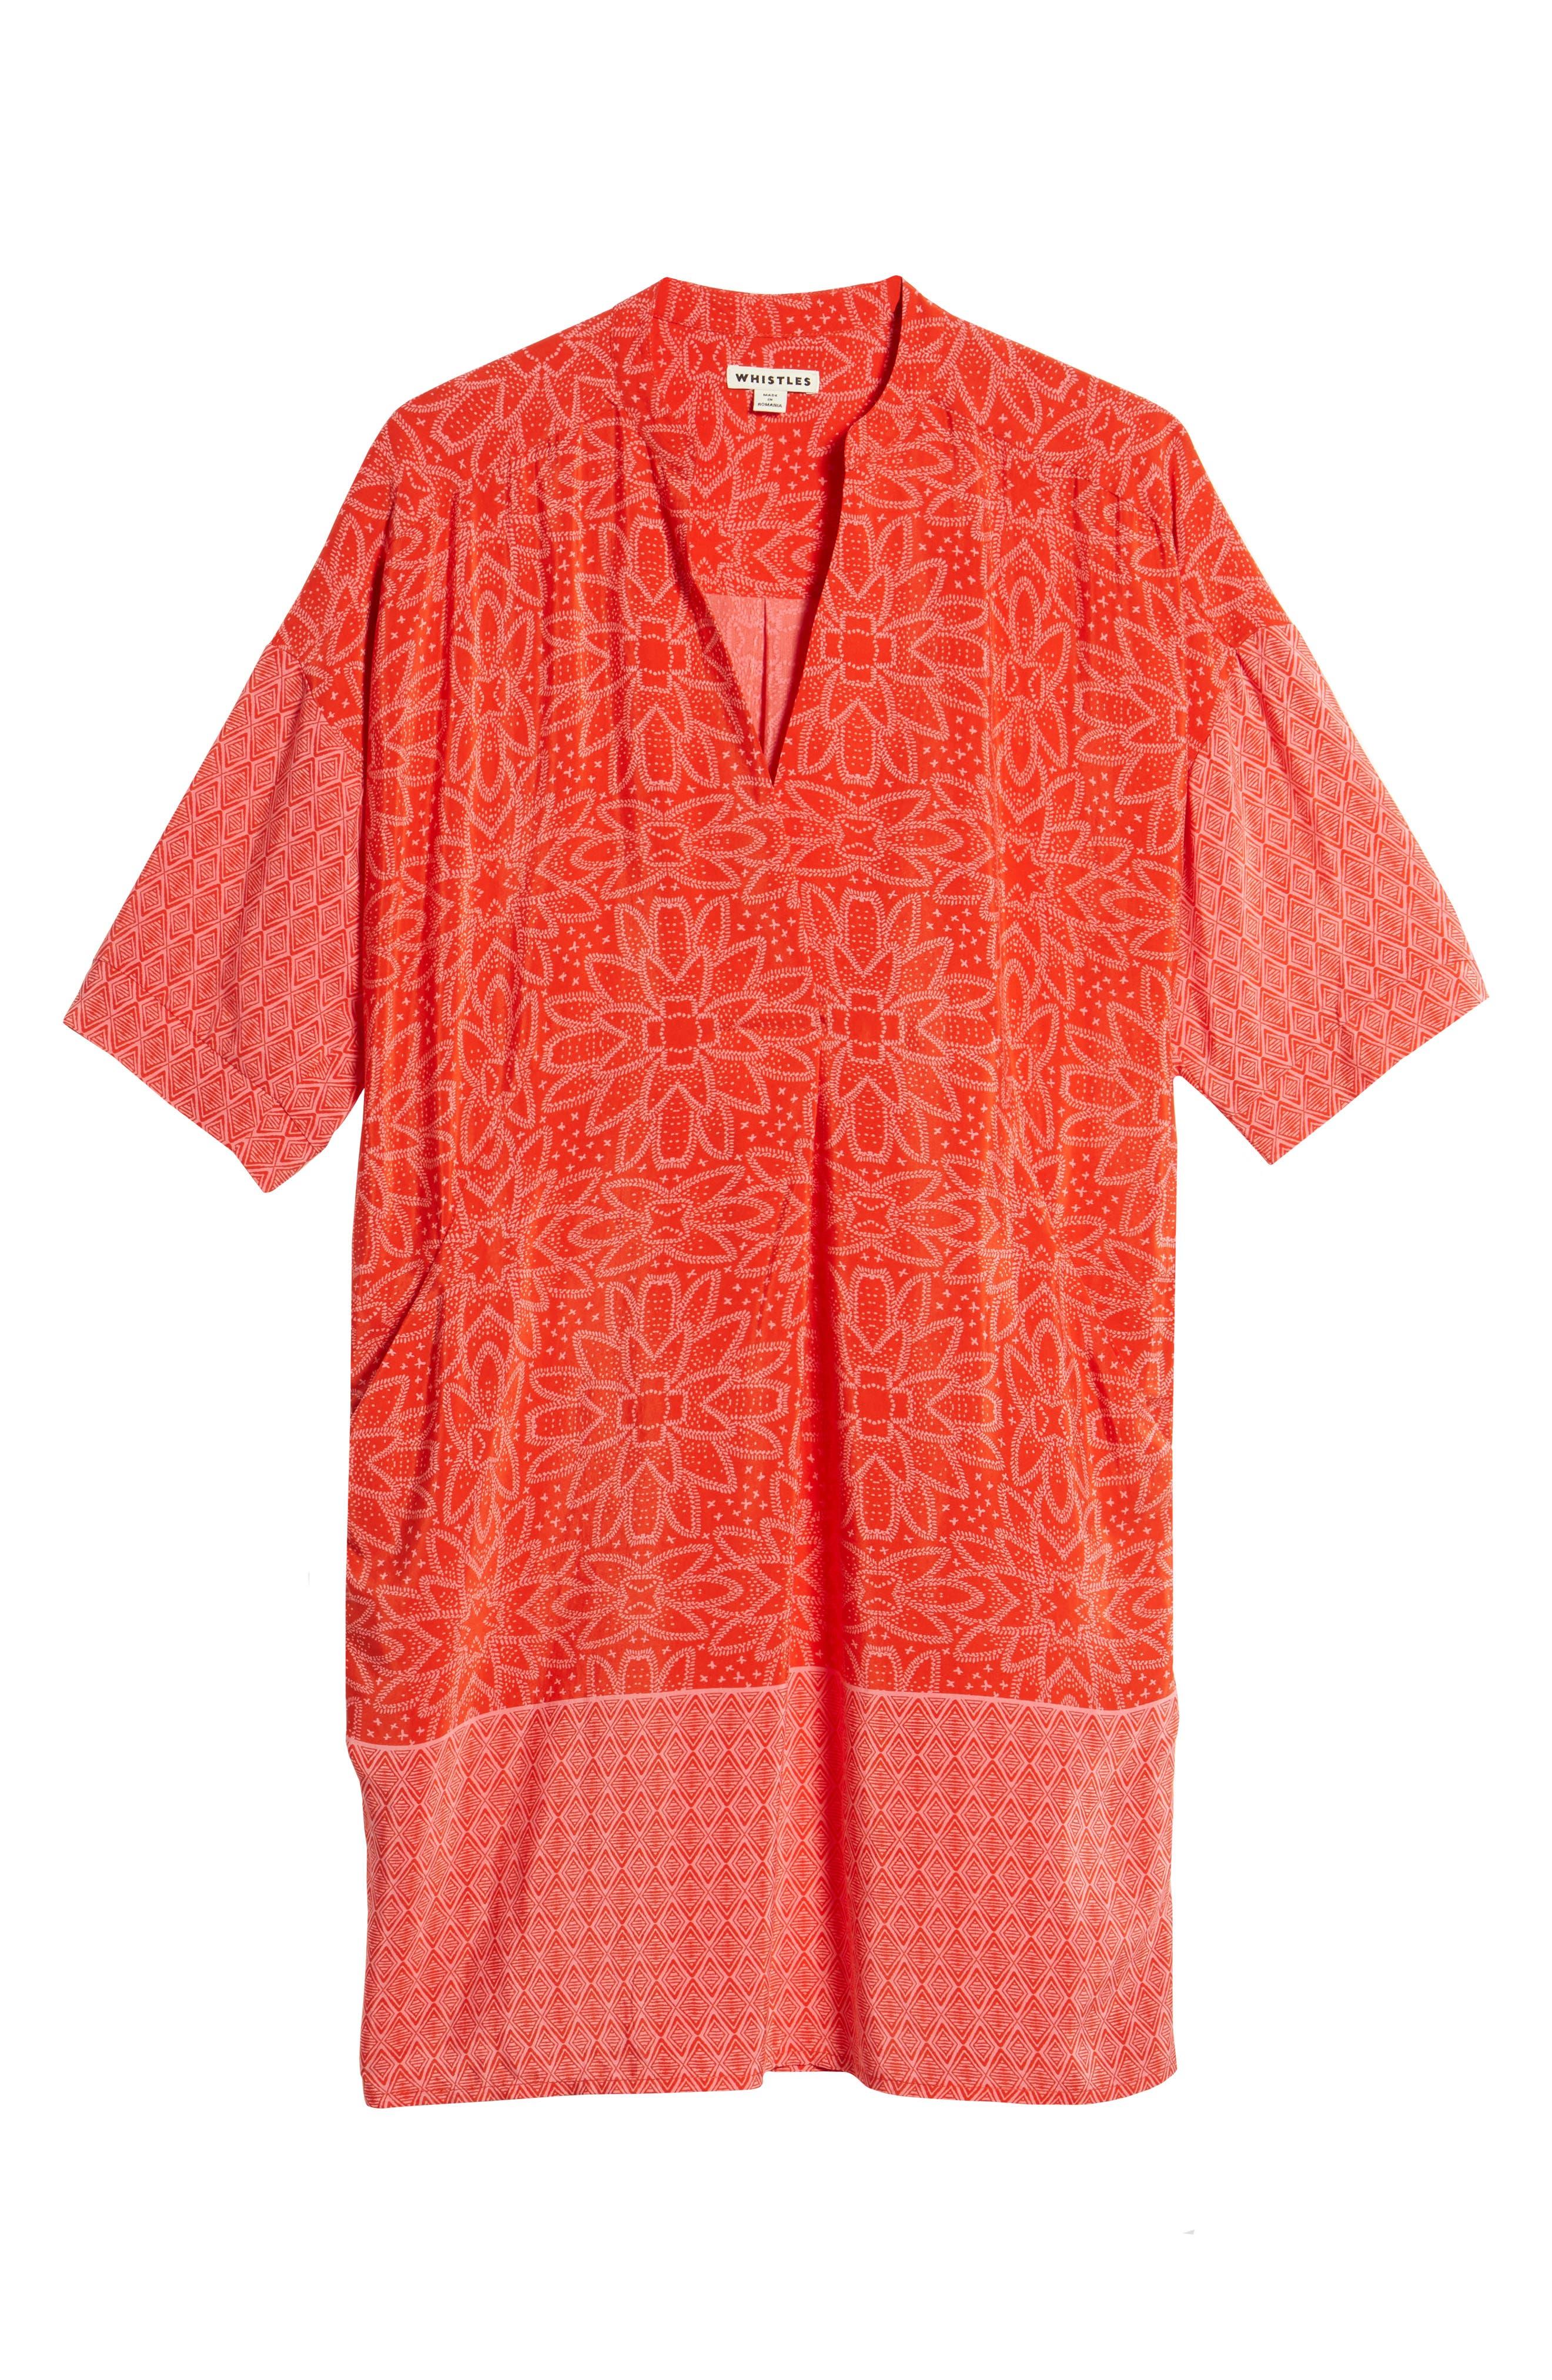 Luna Riya Print Dress,                             Alternate thumbnail 6, color,                             RED/ MULTI